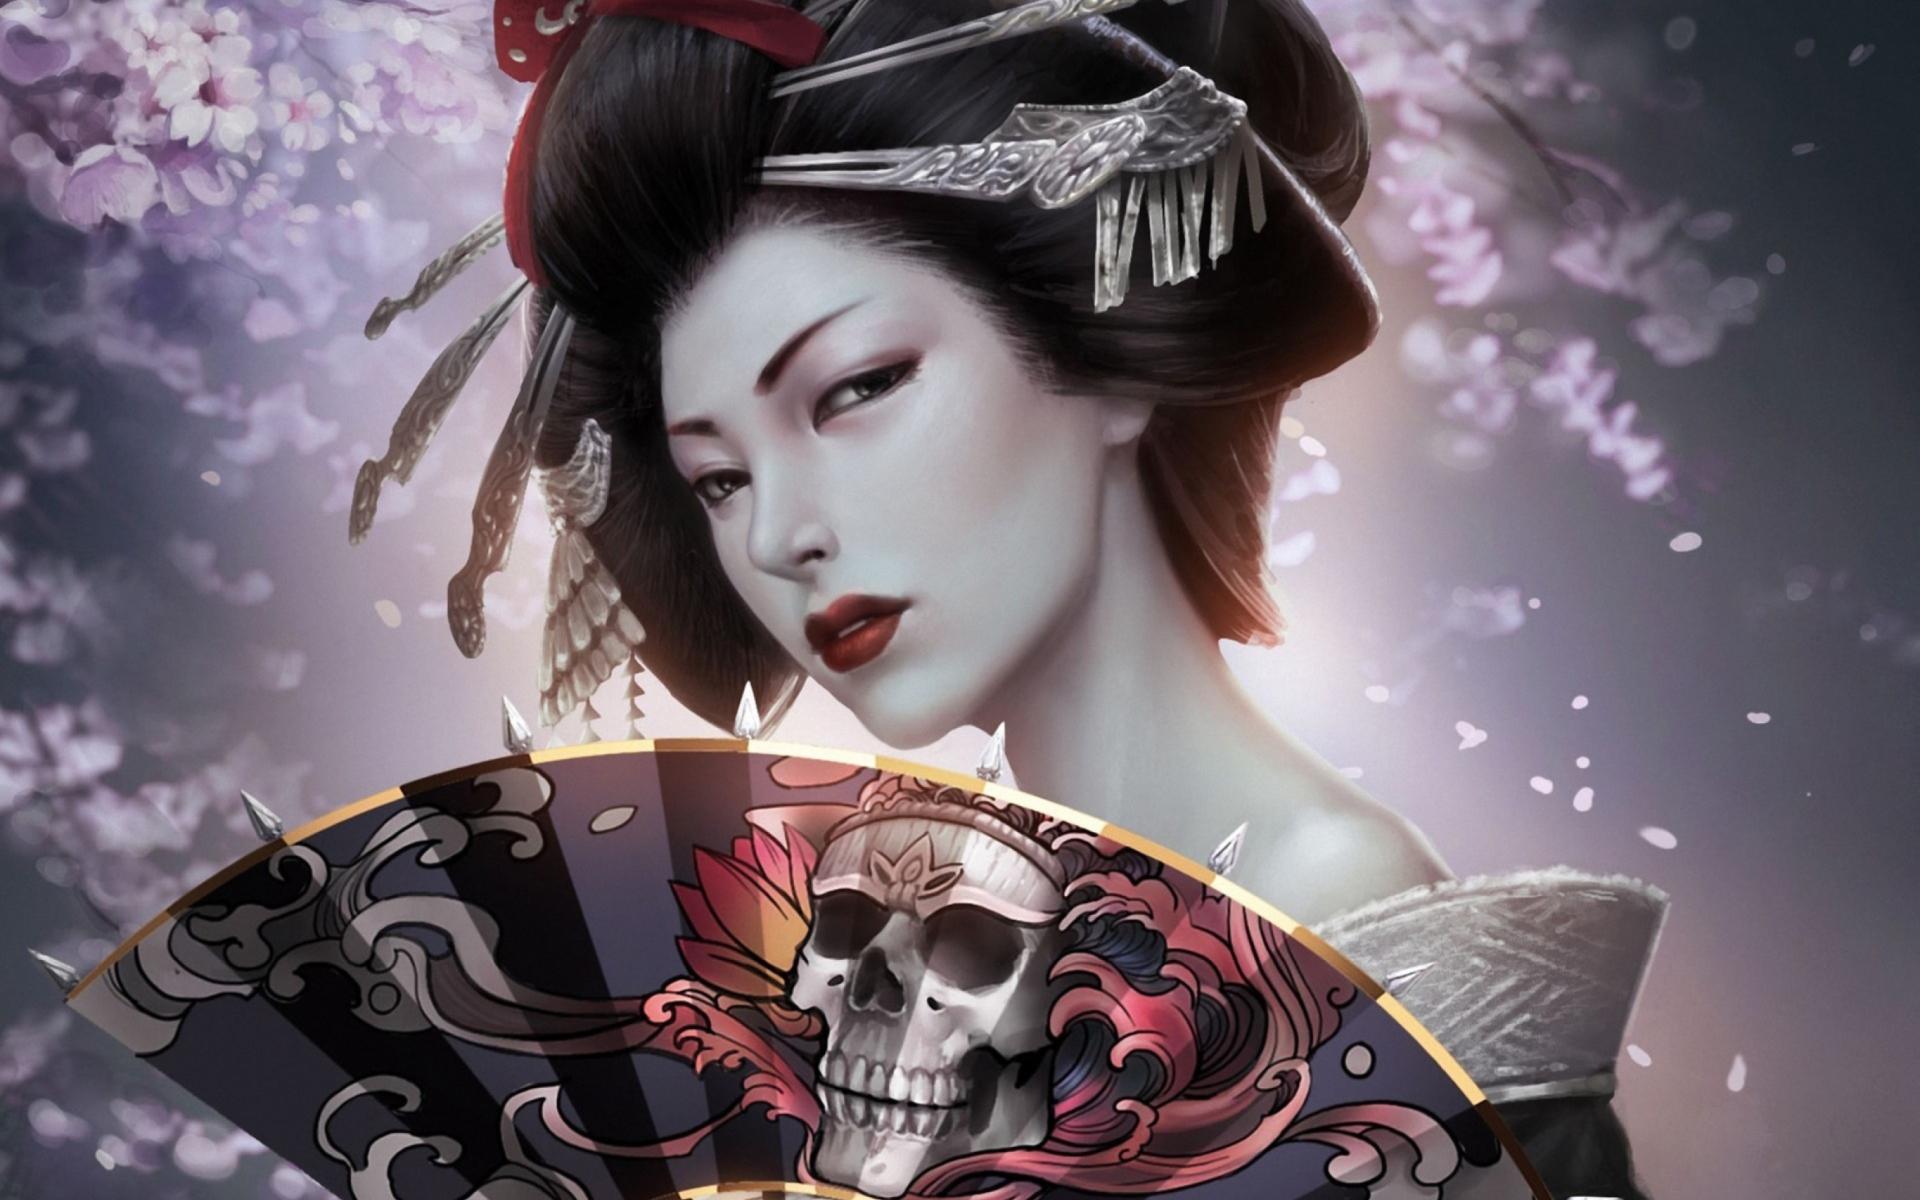 Gothic Geisha Full HD Wallpaper And Background  1920x1200 ID692971